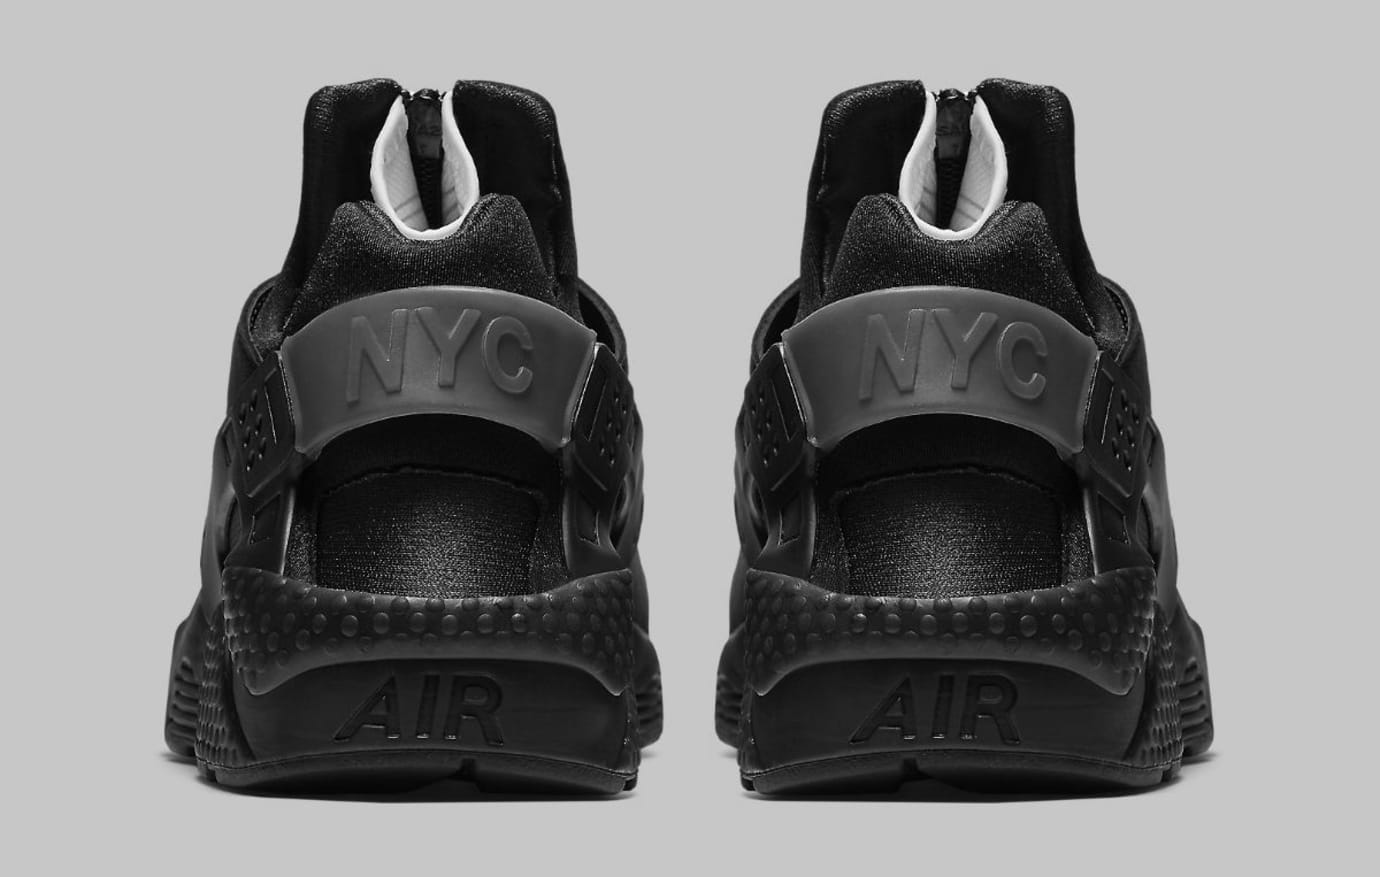 510033ad69786 Nike Air Huarache Run NYC Triple Black Release Date AJ5578-001 Heel